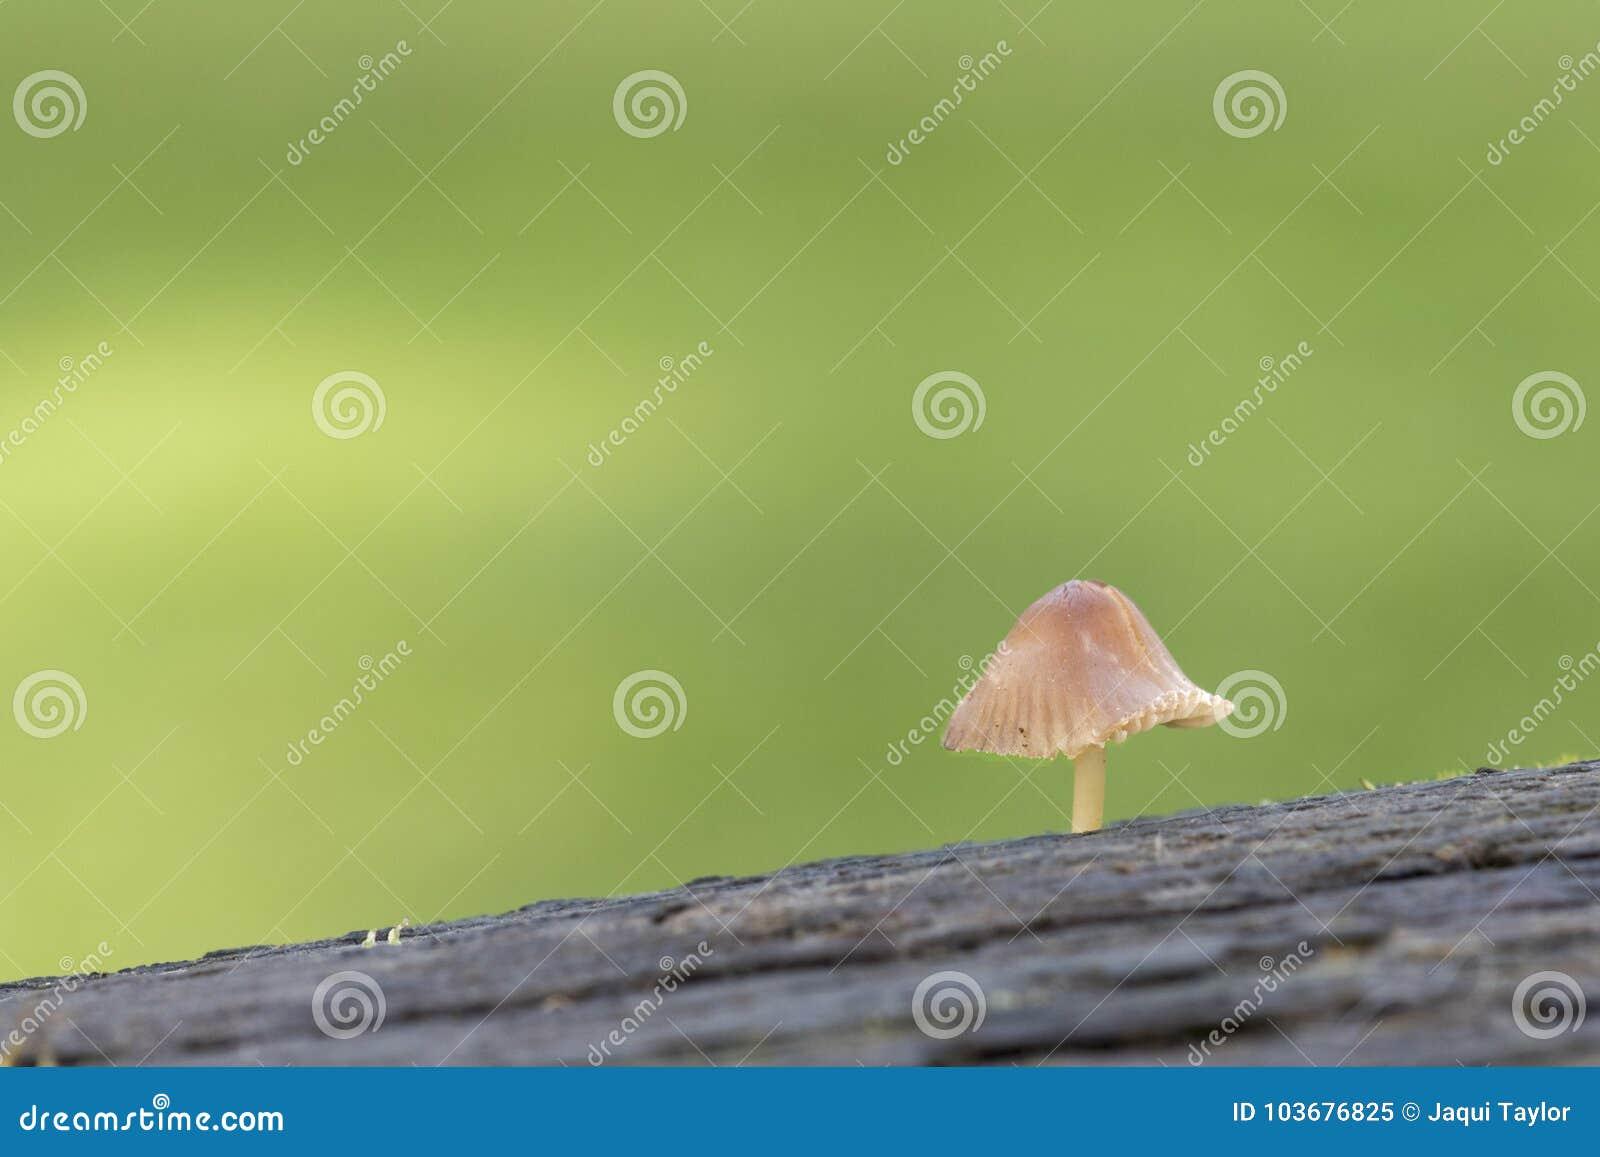 A tiny mushrooms on Southampton Common